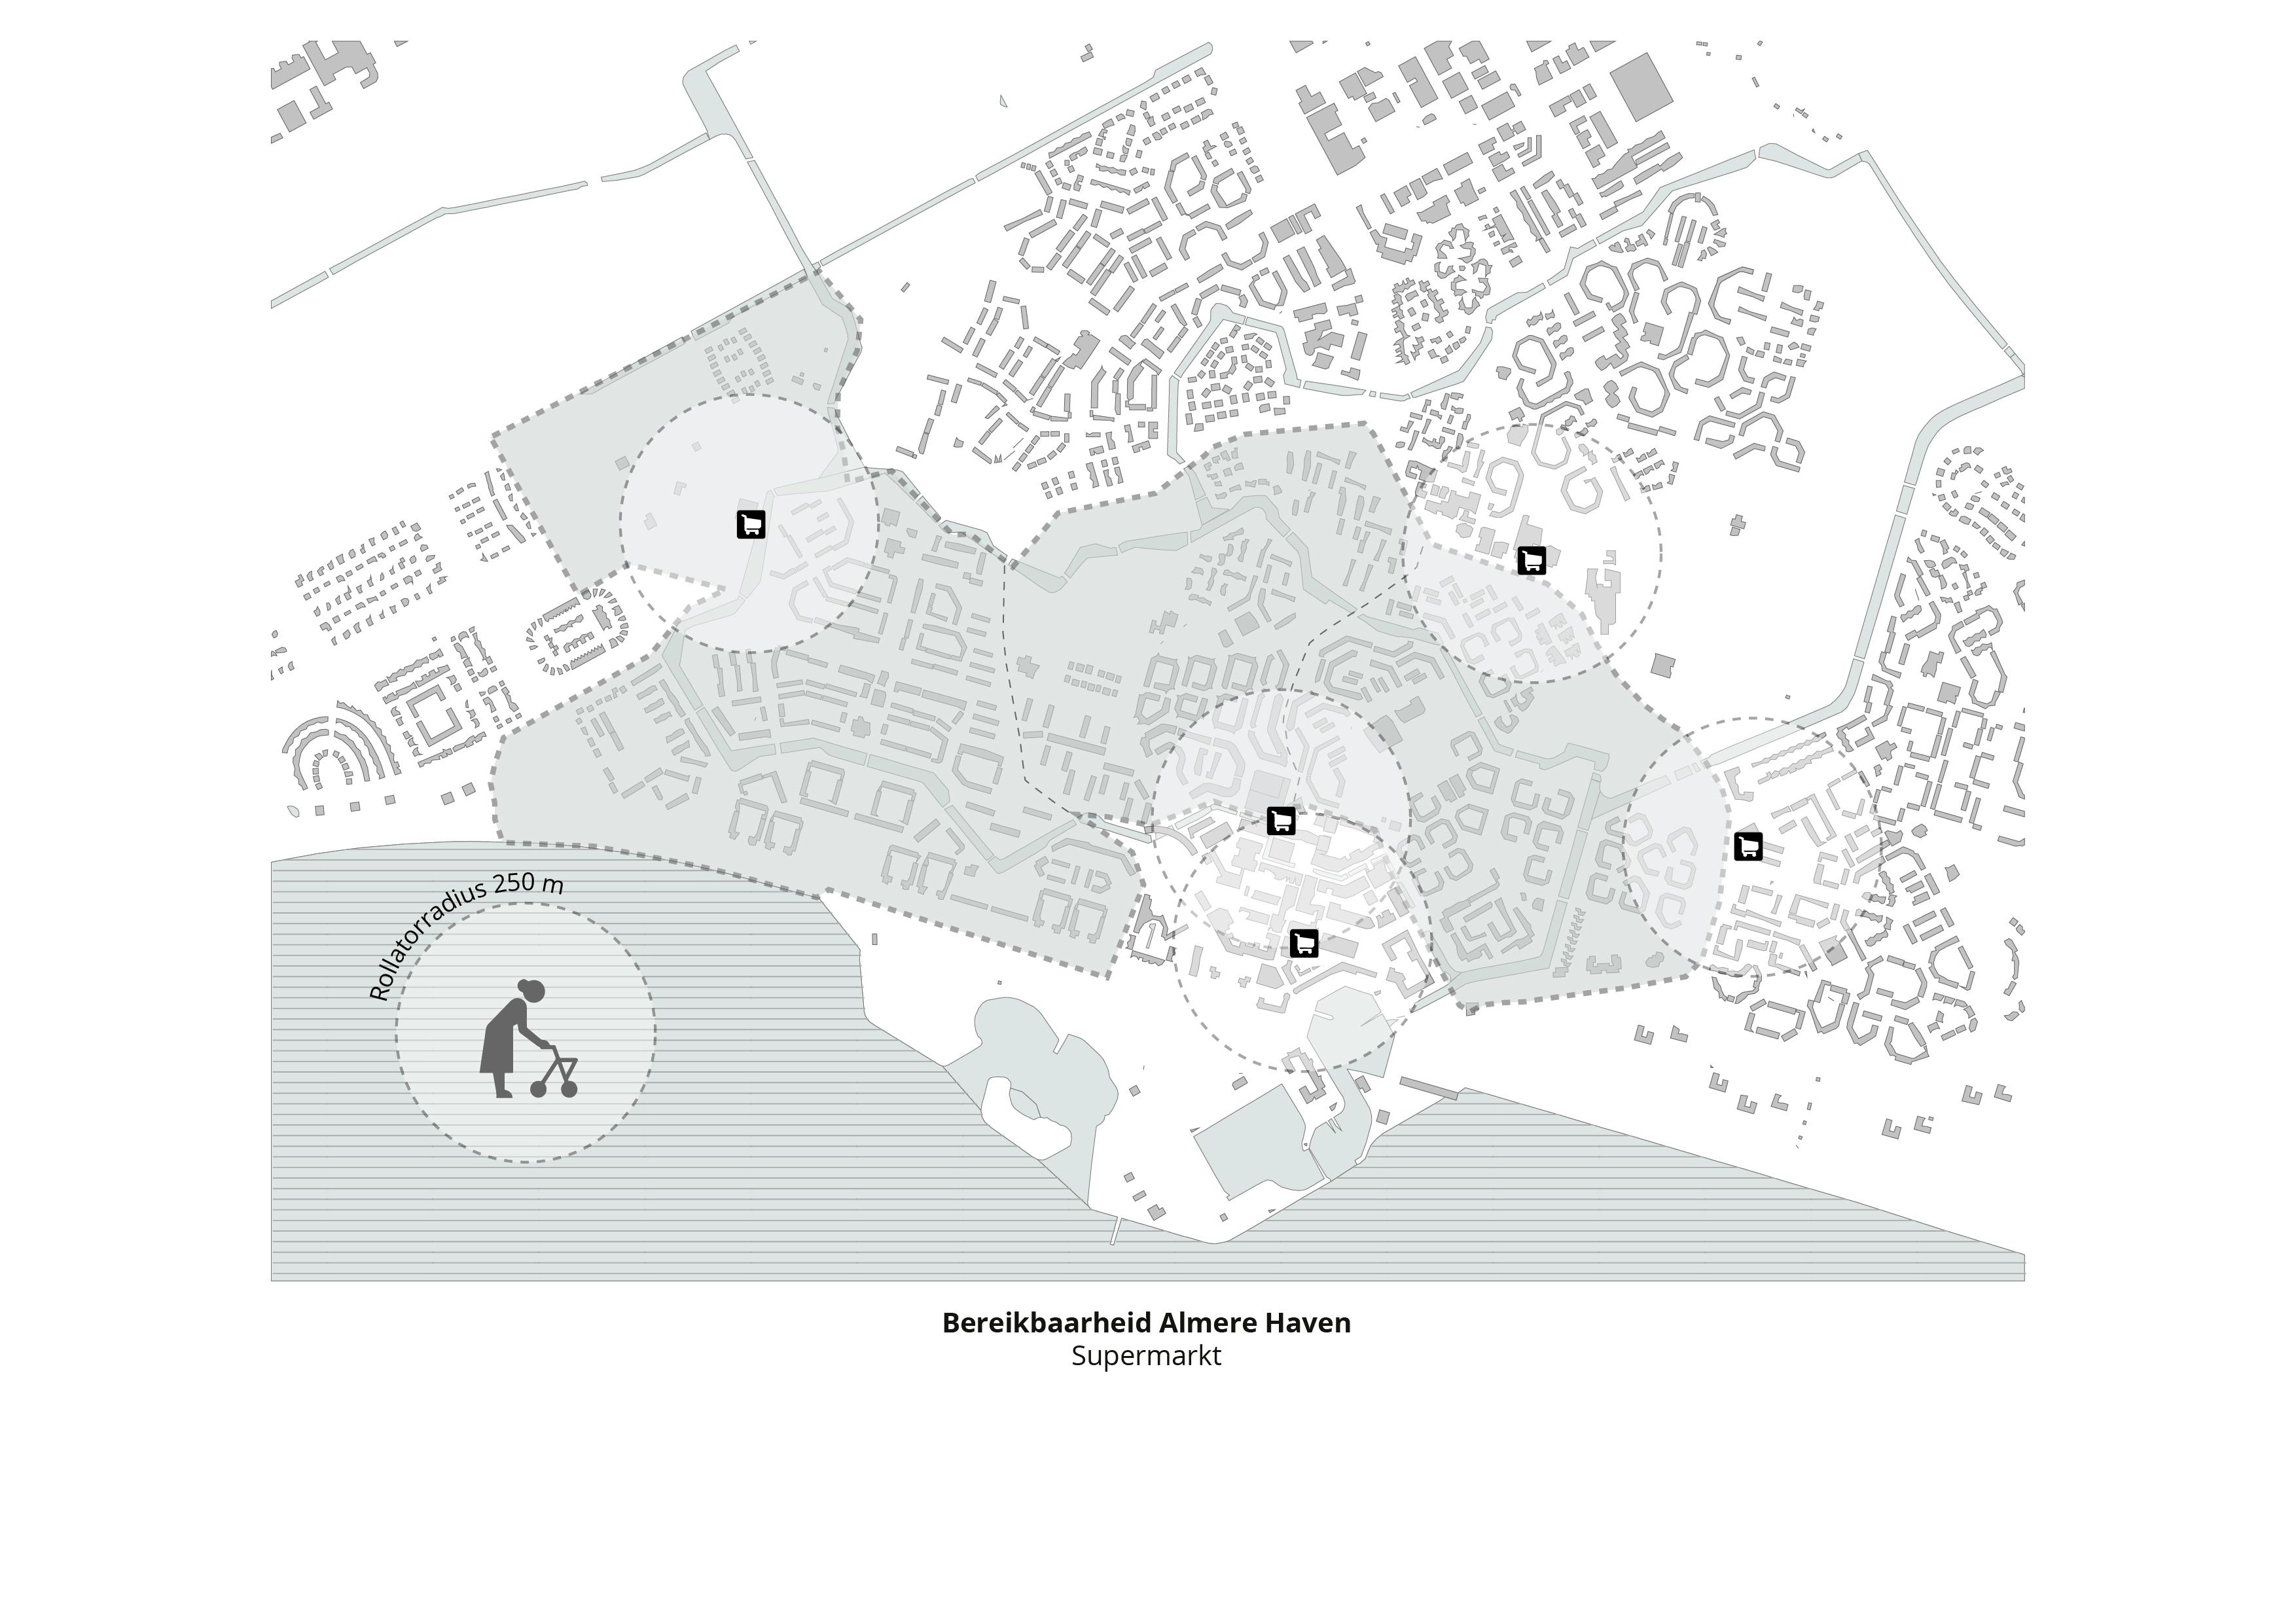 Koppelknopen Almere Haven – Supermarkt